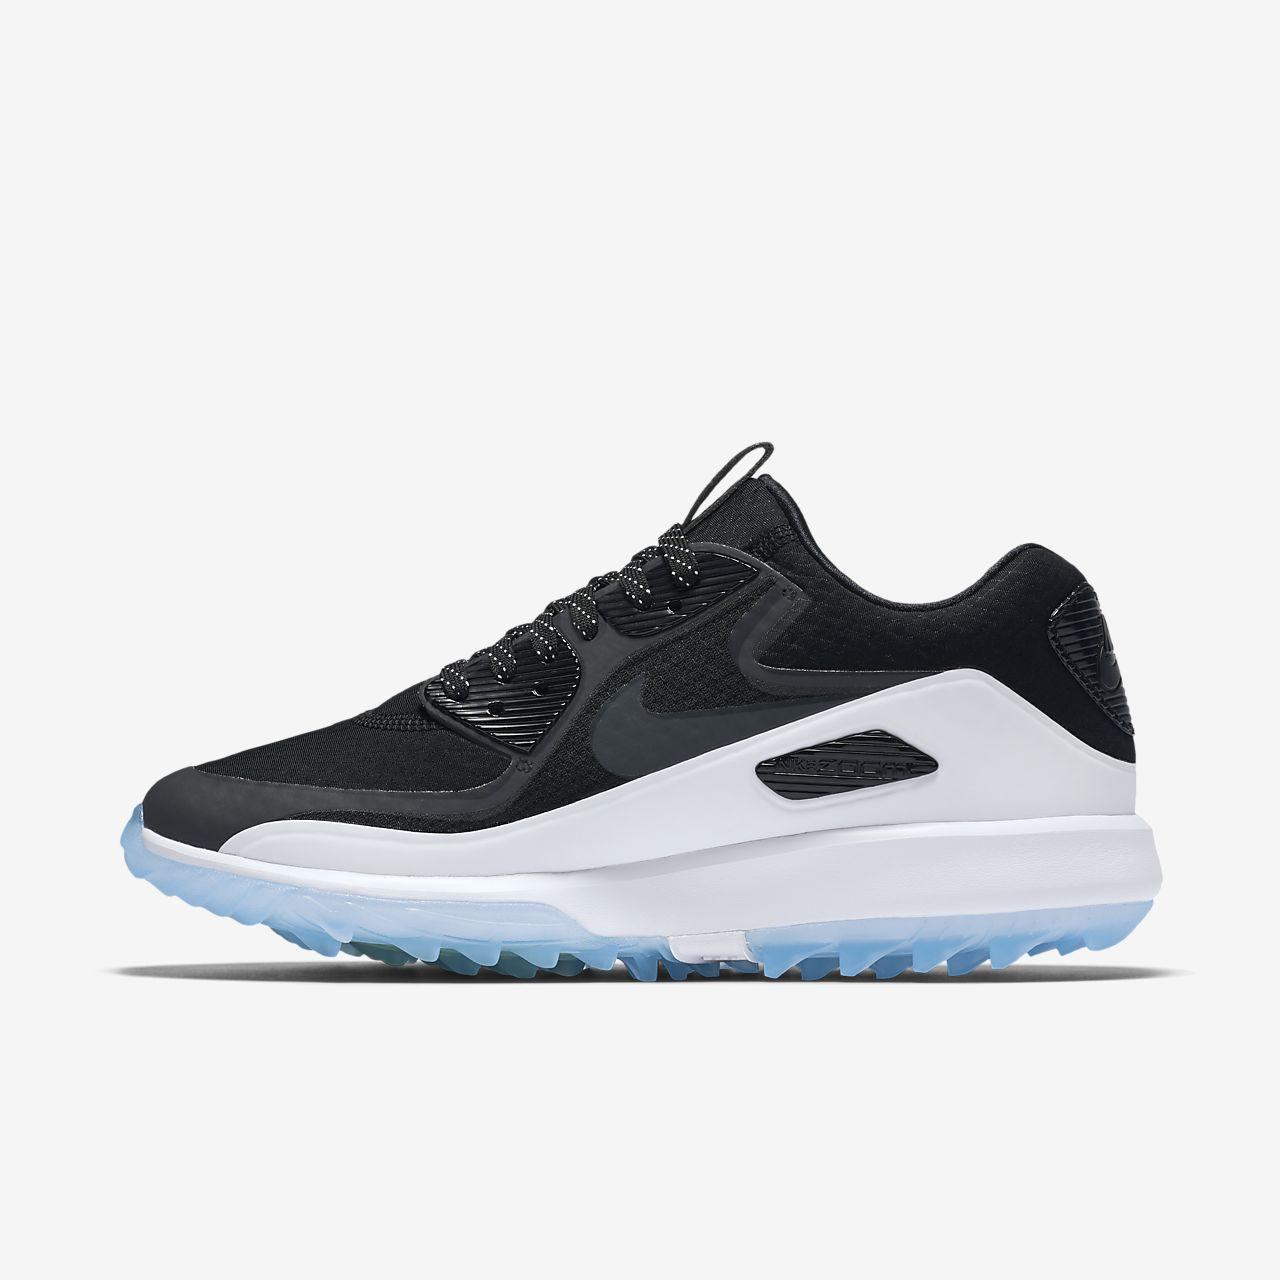 f466bd3480 Nike Air Zoom 90 IT Women's Golf Shoe. Nike.com GB